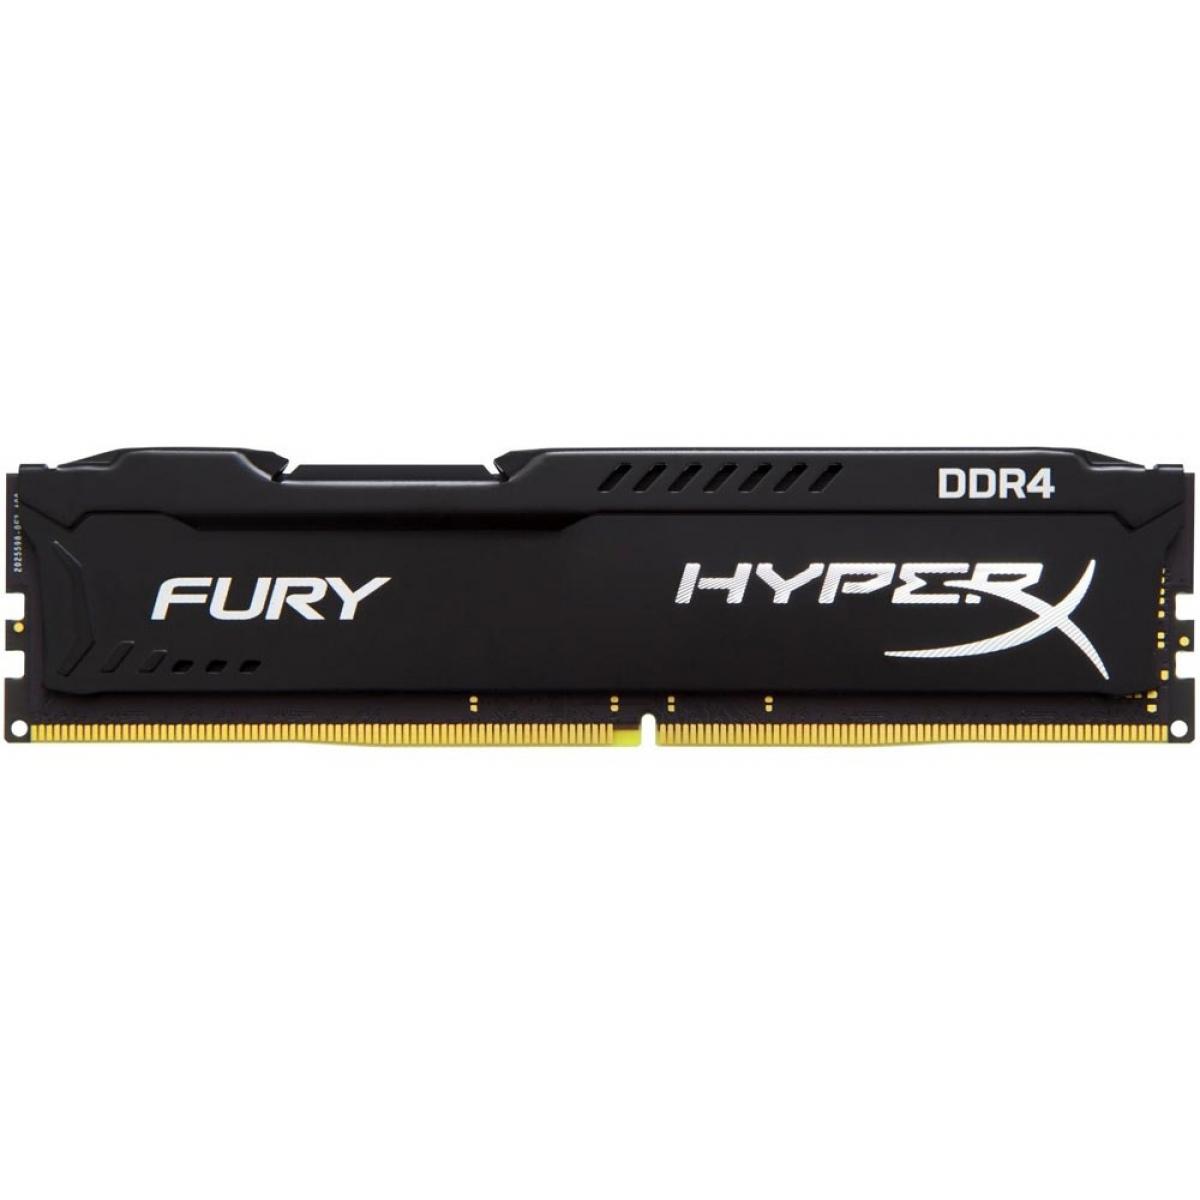 Memória DDR4 Kingston HyperX Fury, 8GB 2400MHz, HX424C15FB2/8